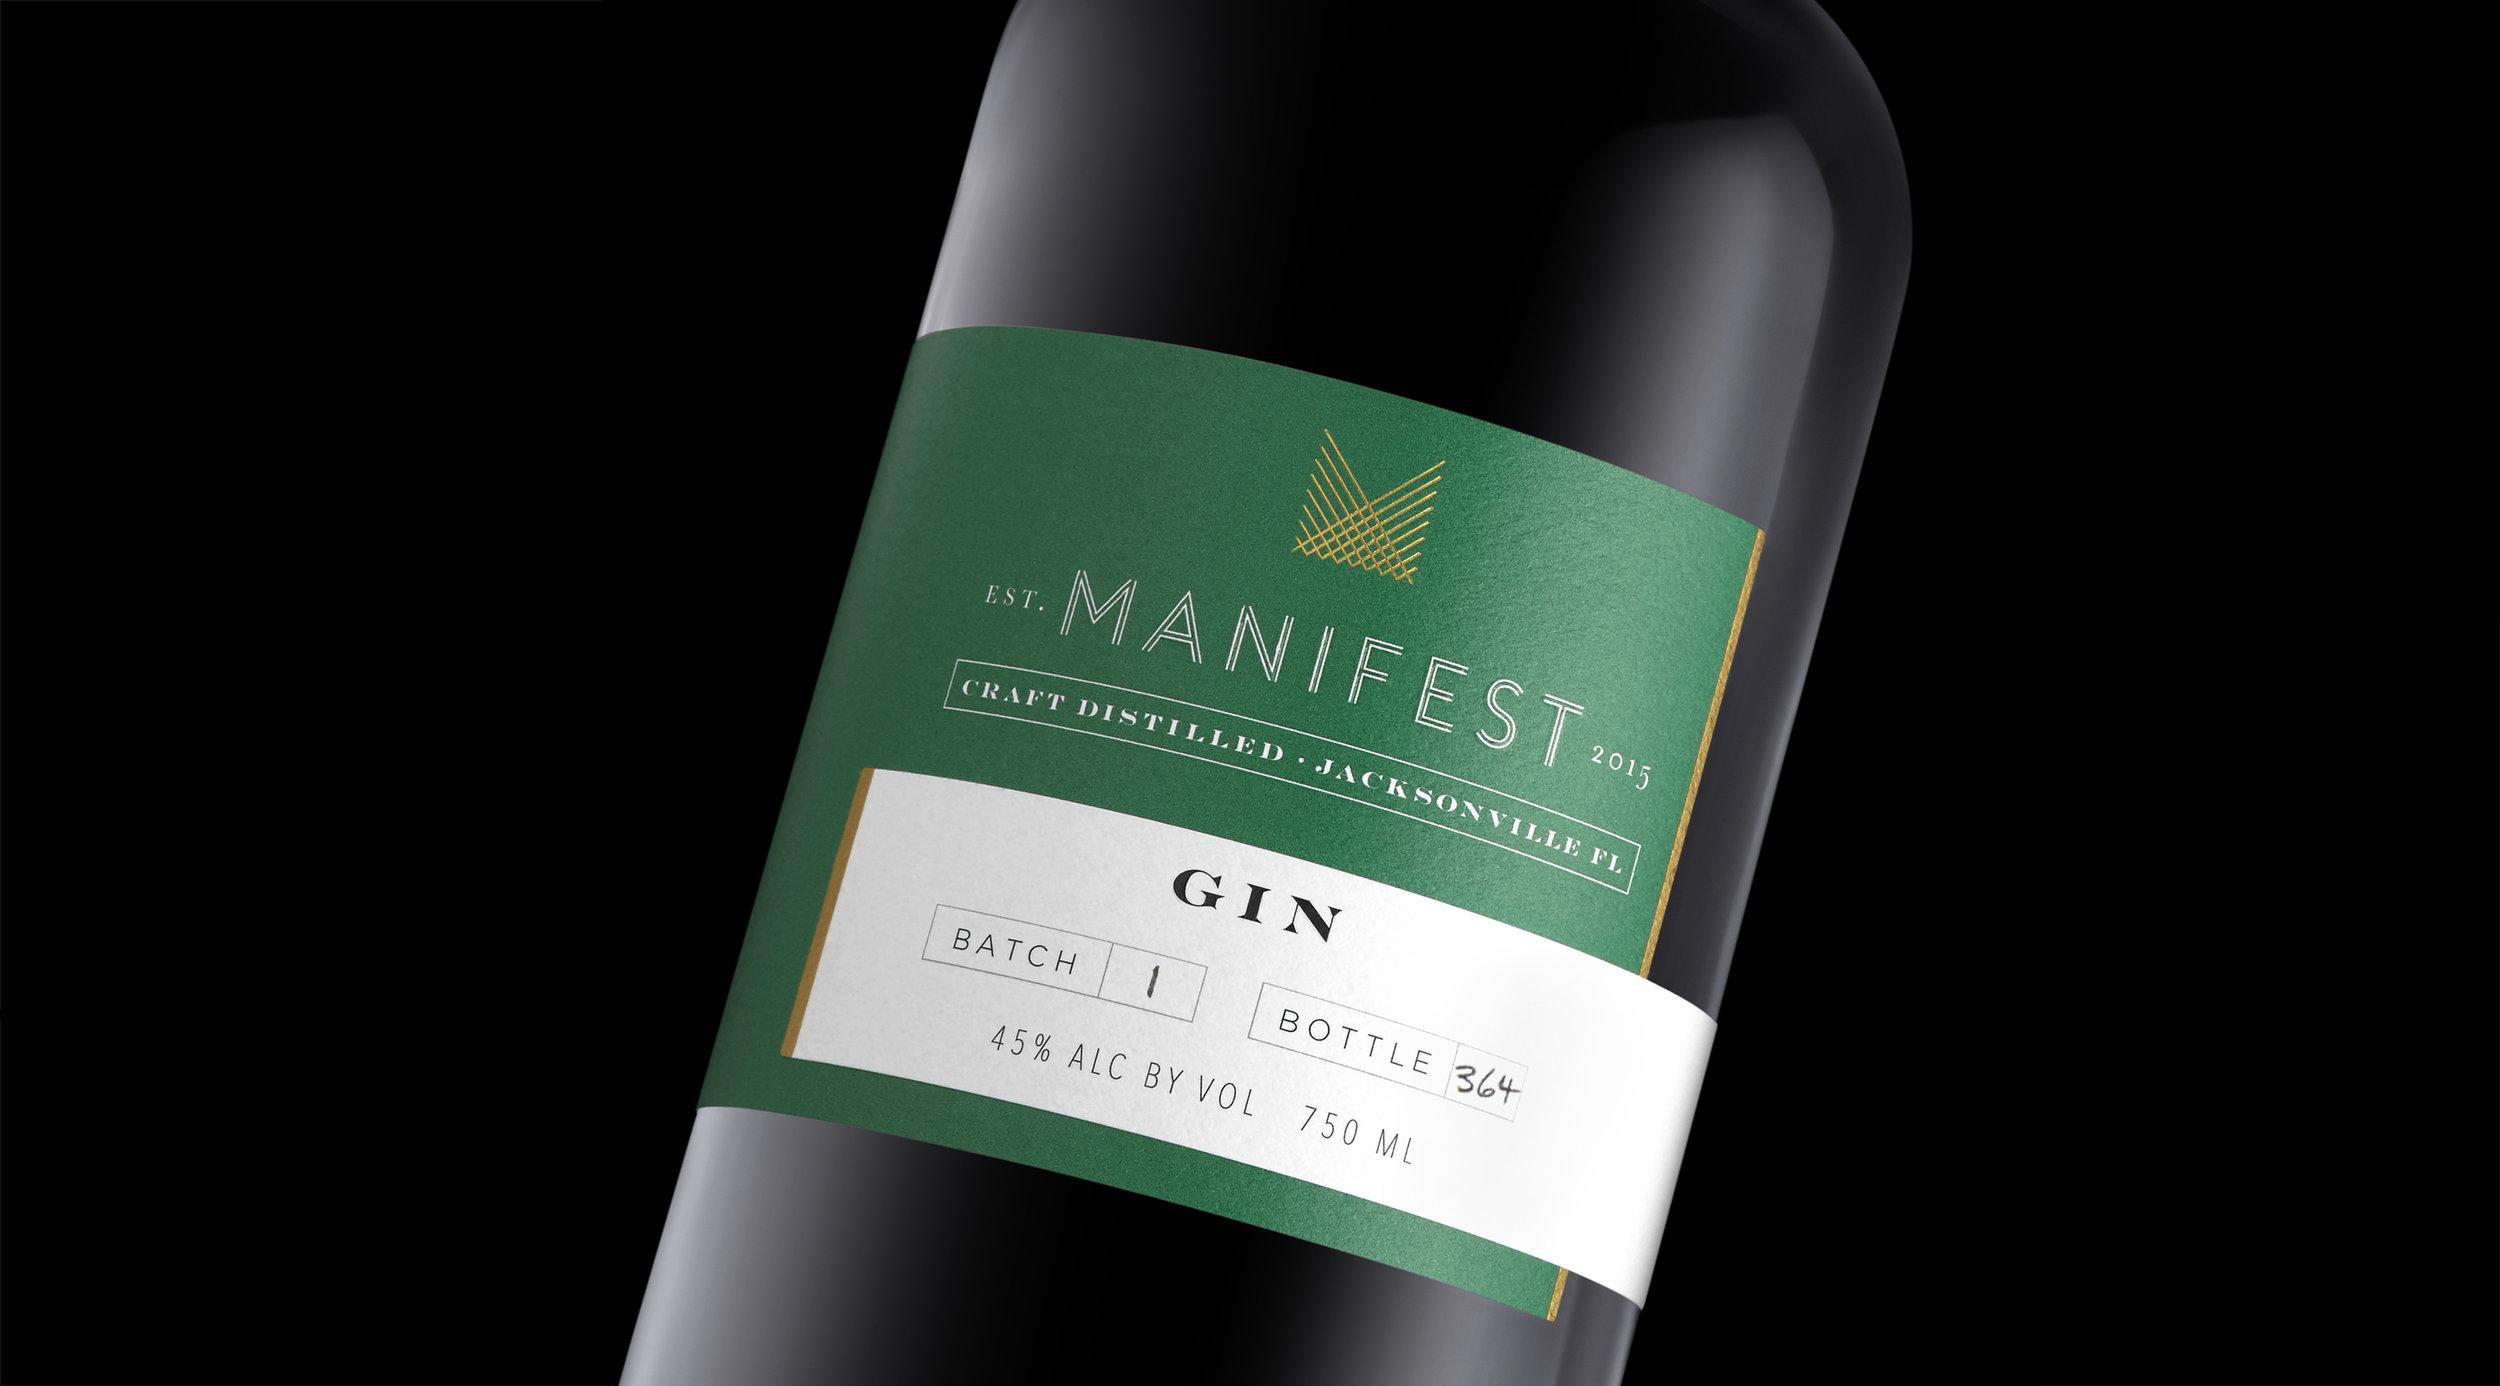 12_1_16_Manifest_Gin_LabelDetail_F_V2_Numbers.jpg